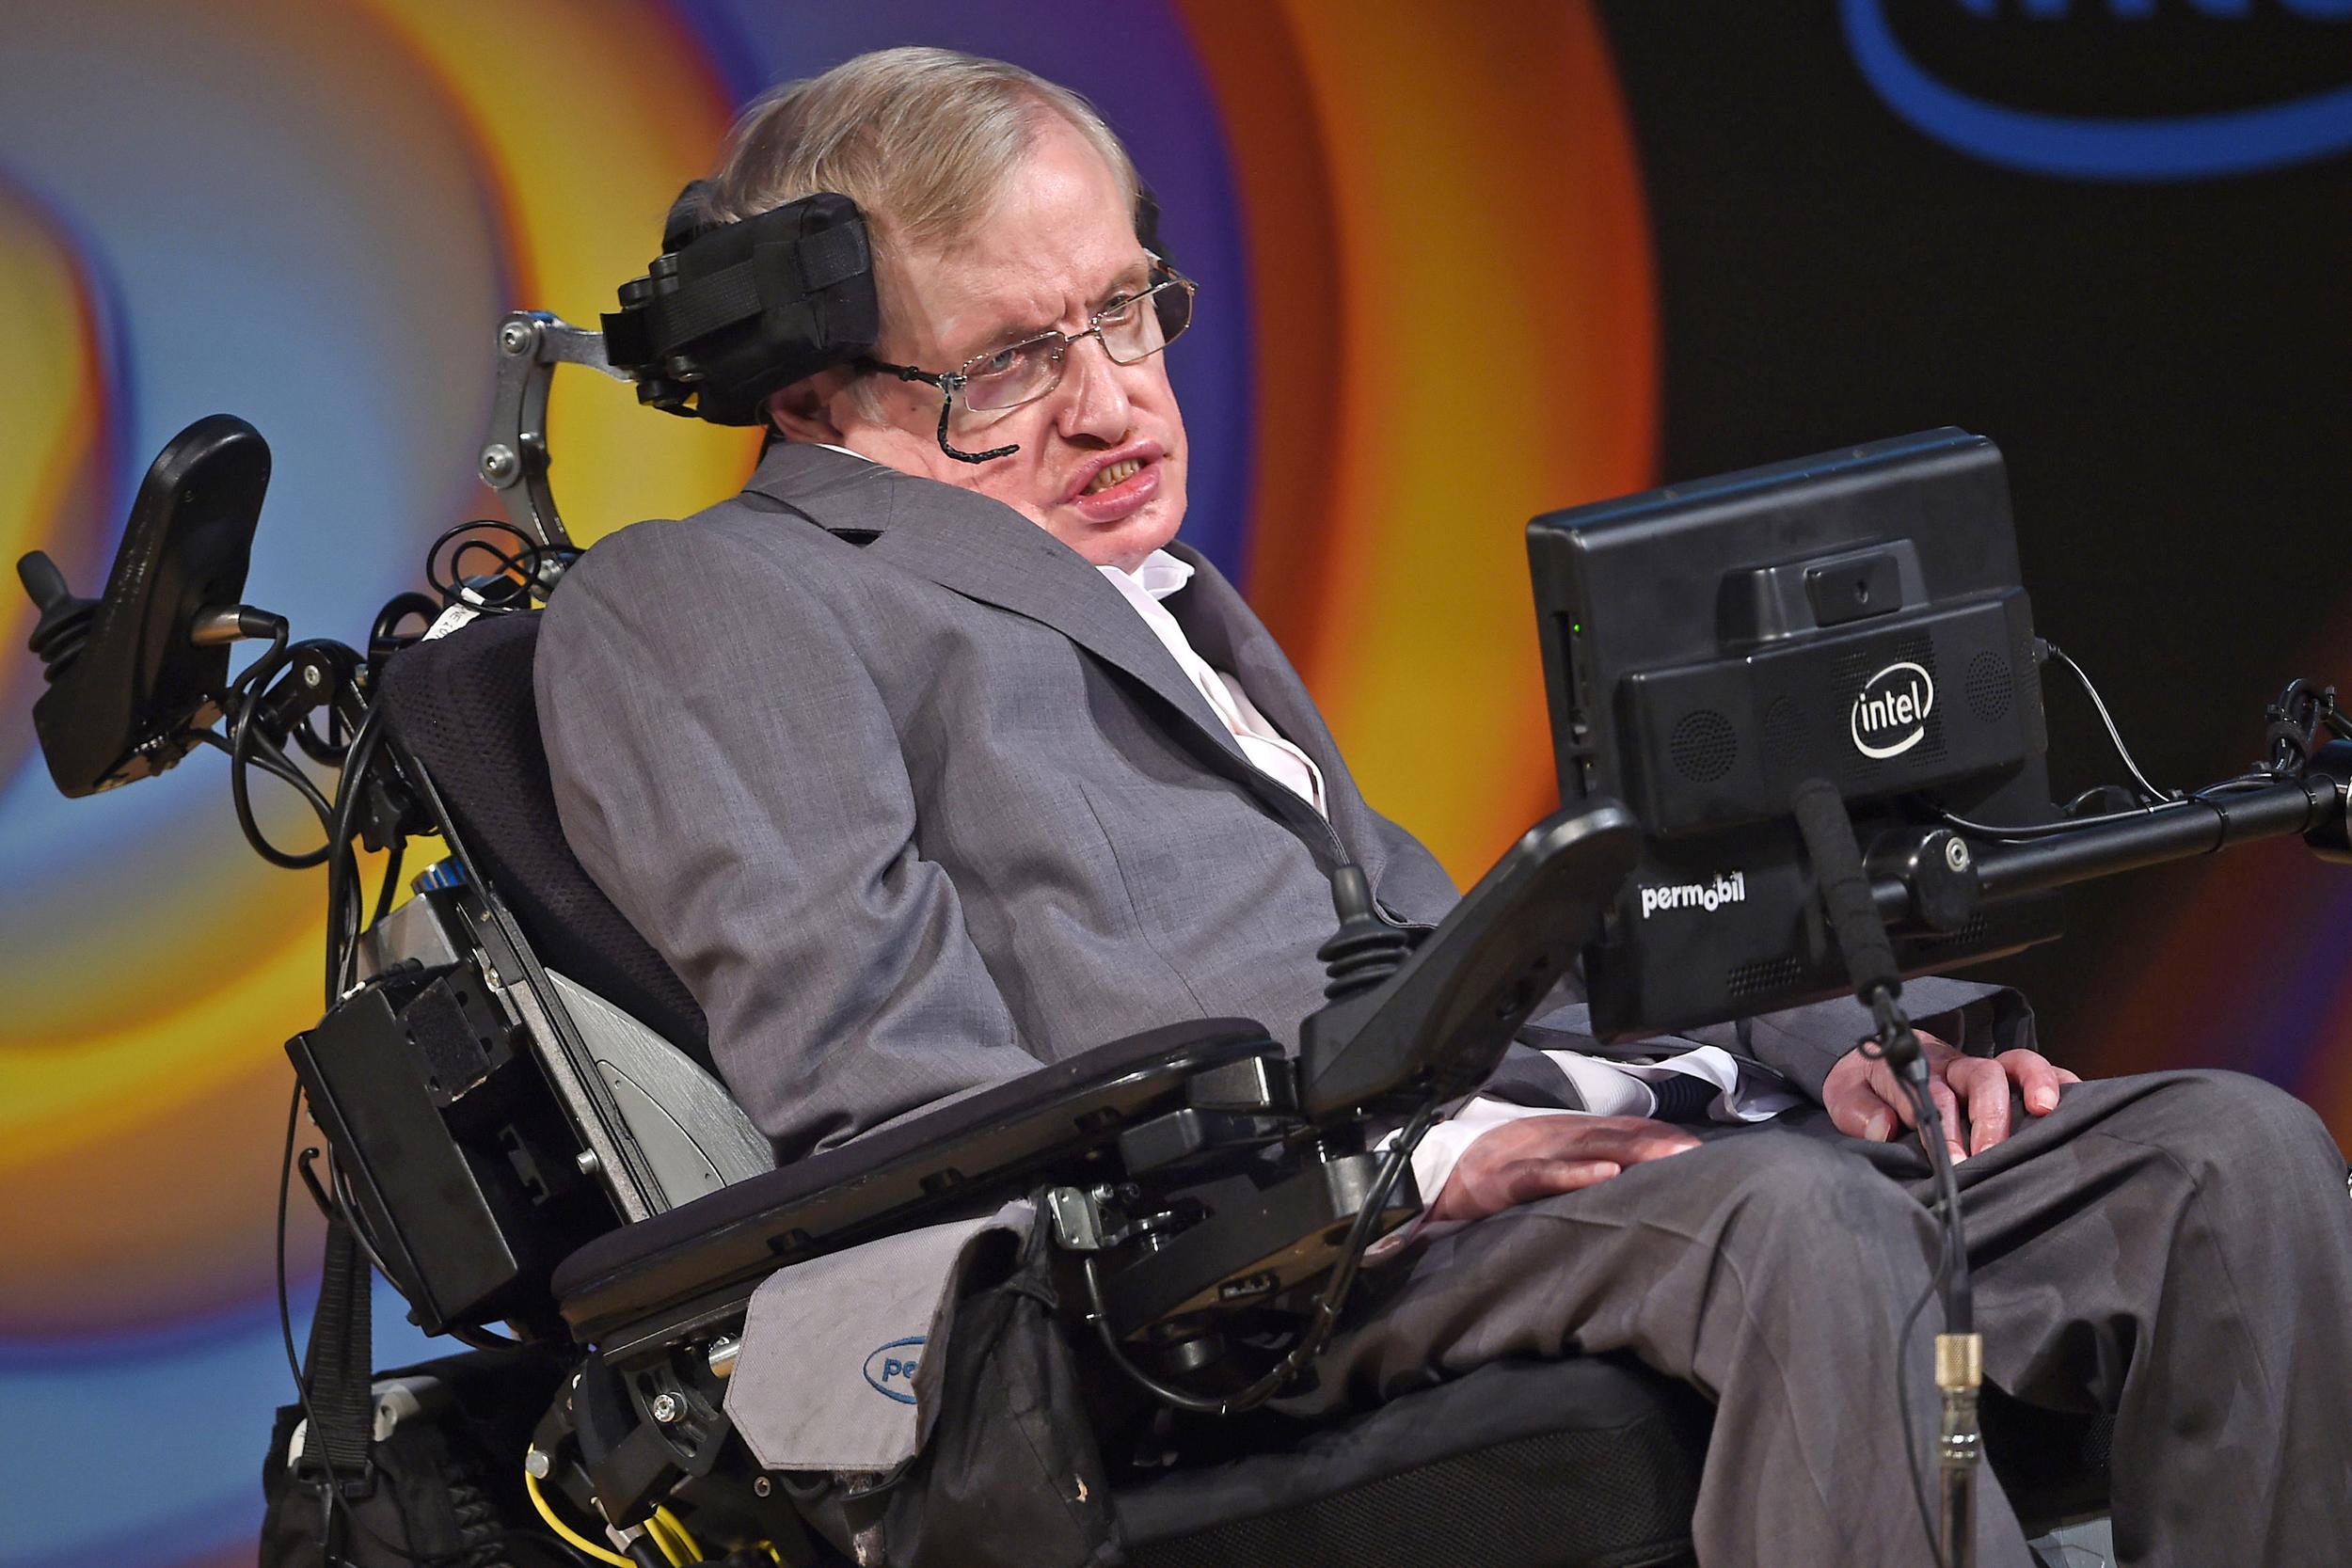 Stephen Hawking symposium